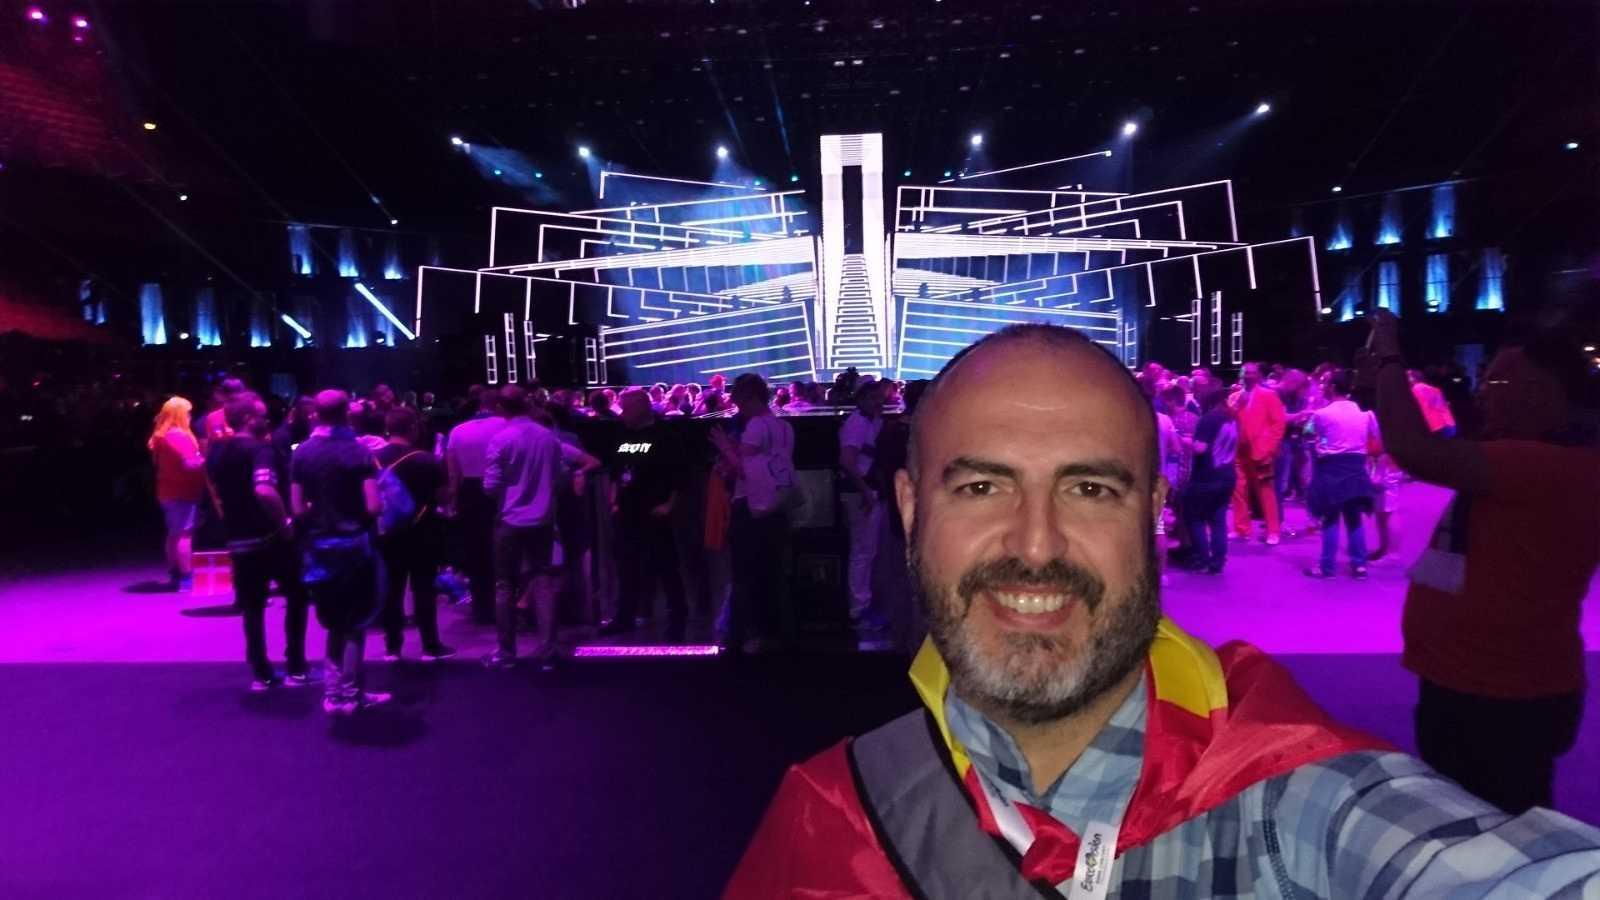 La sala - De cara a 2021: Eurovisión en Rotterdam, por Javier Marín - 16/05/20 - Escuchar ahora